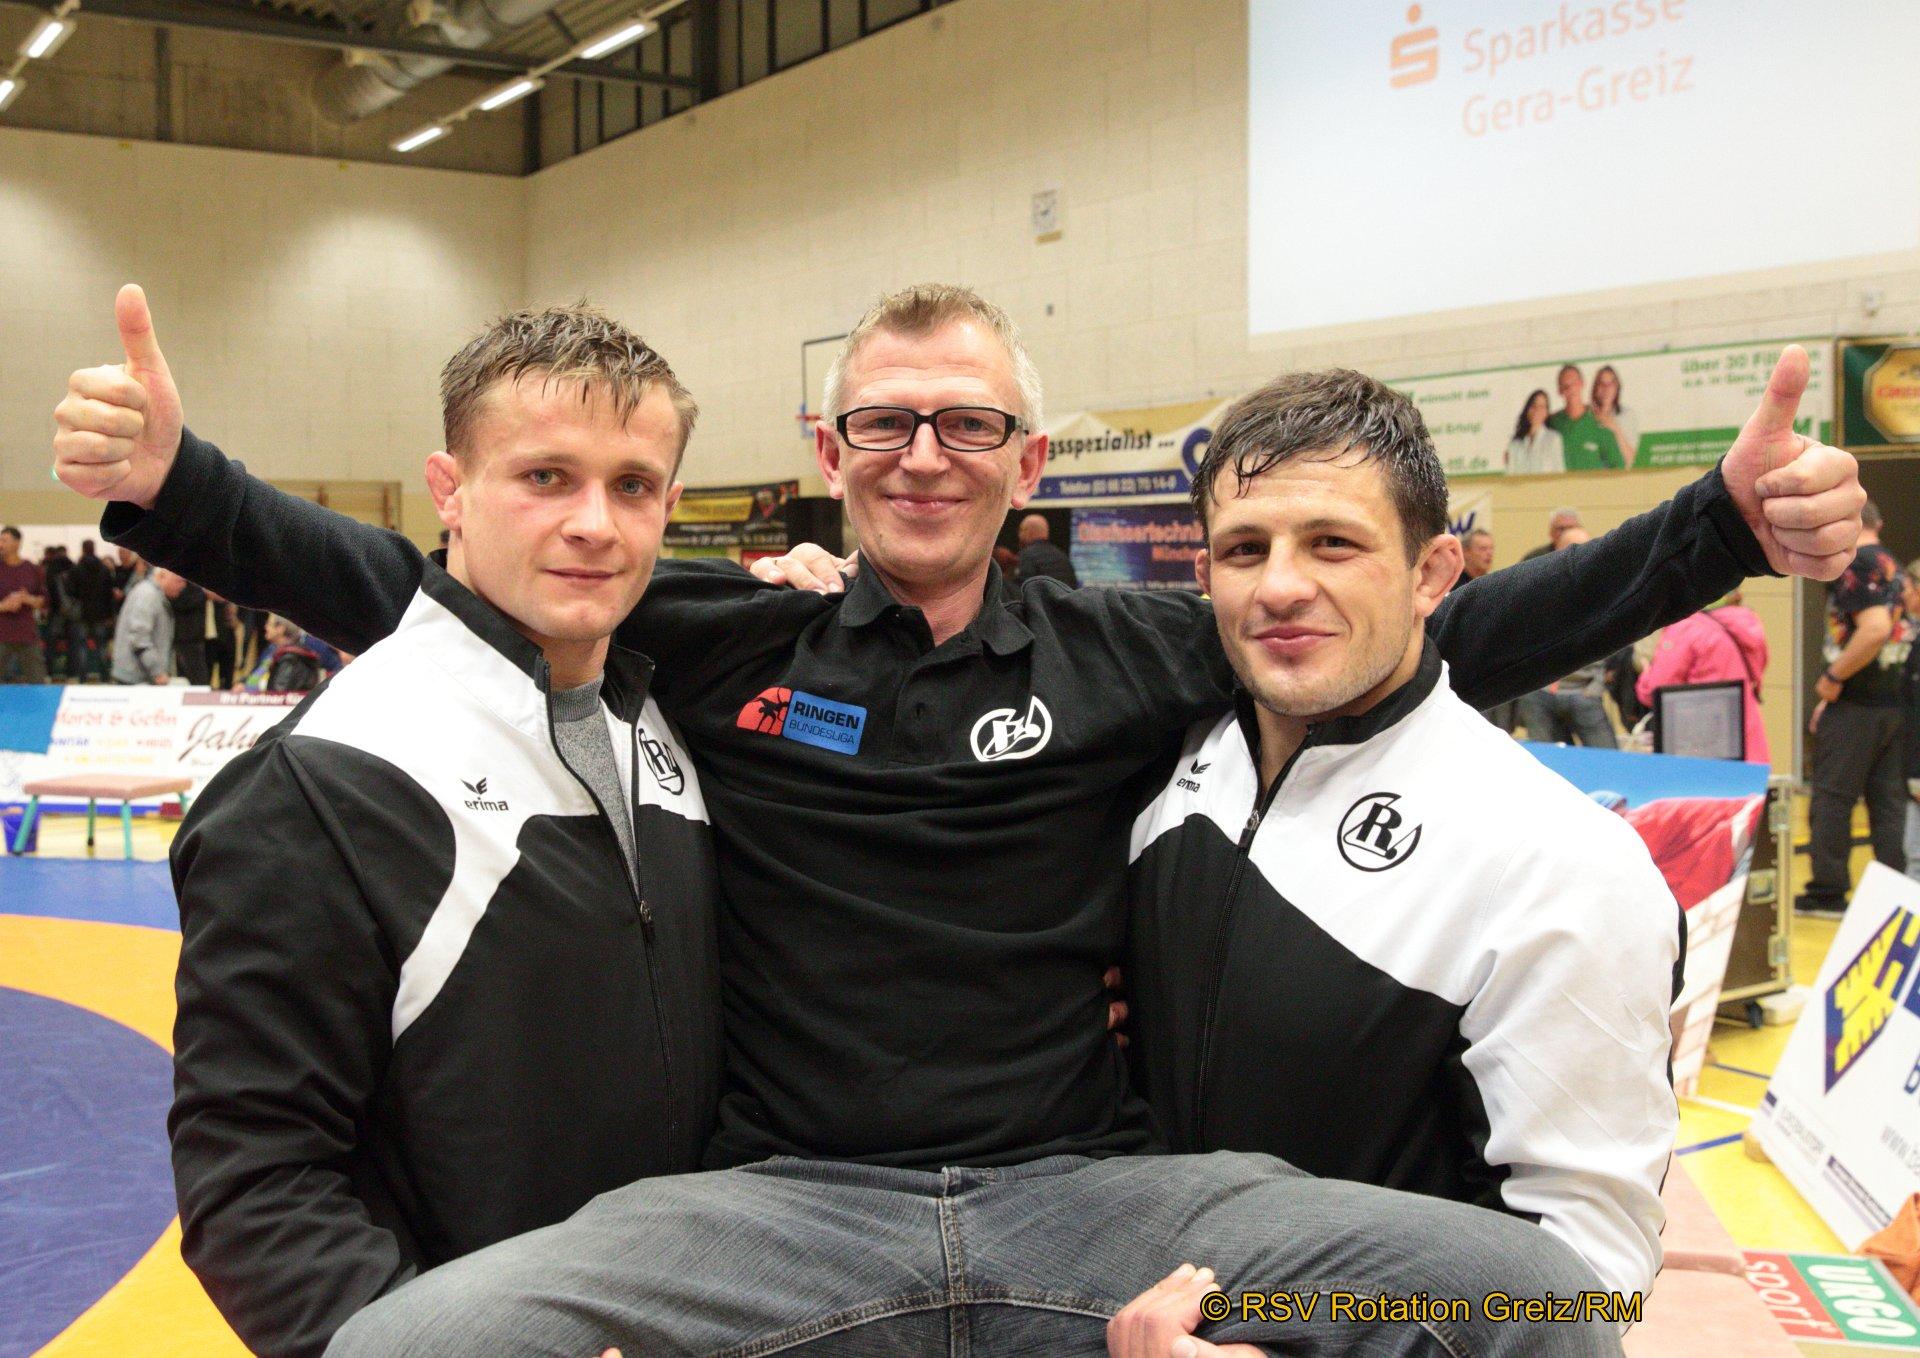 Mateusz Wolny, Sponsor Maik Wolfrum und Igor Besleaga